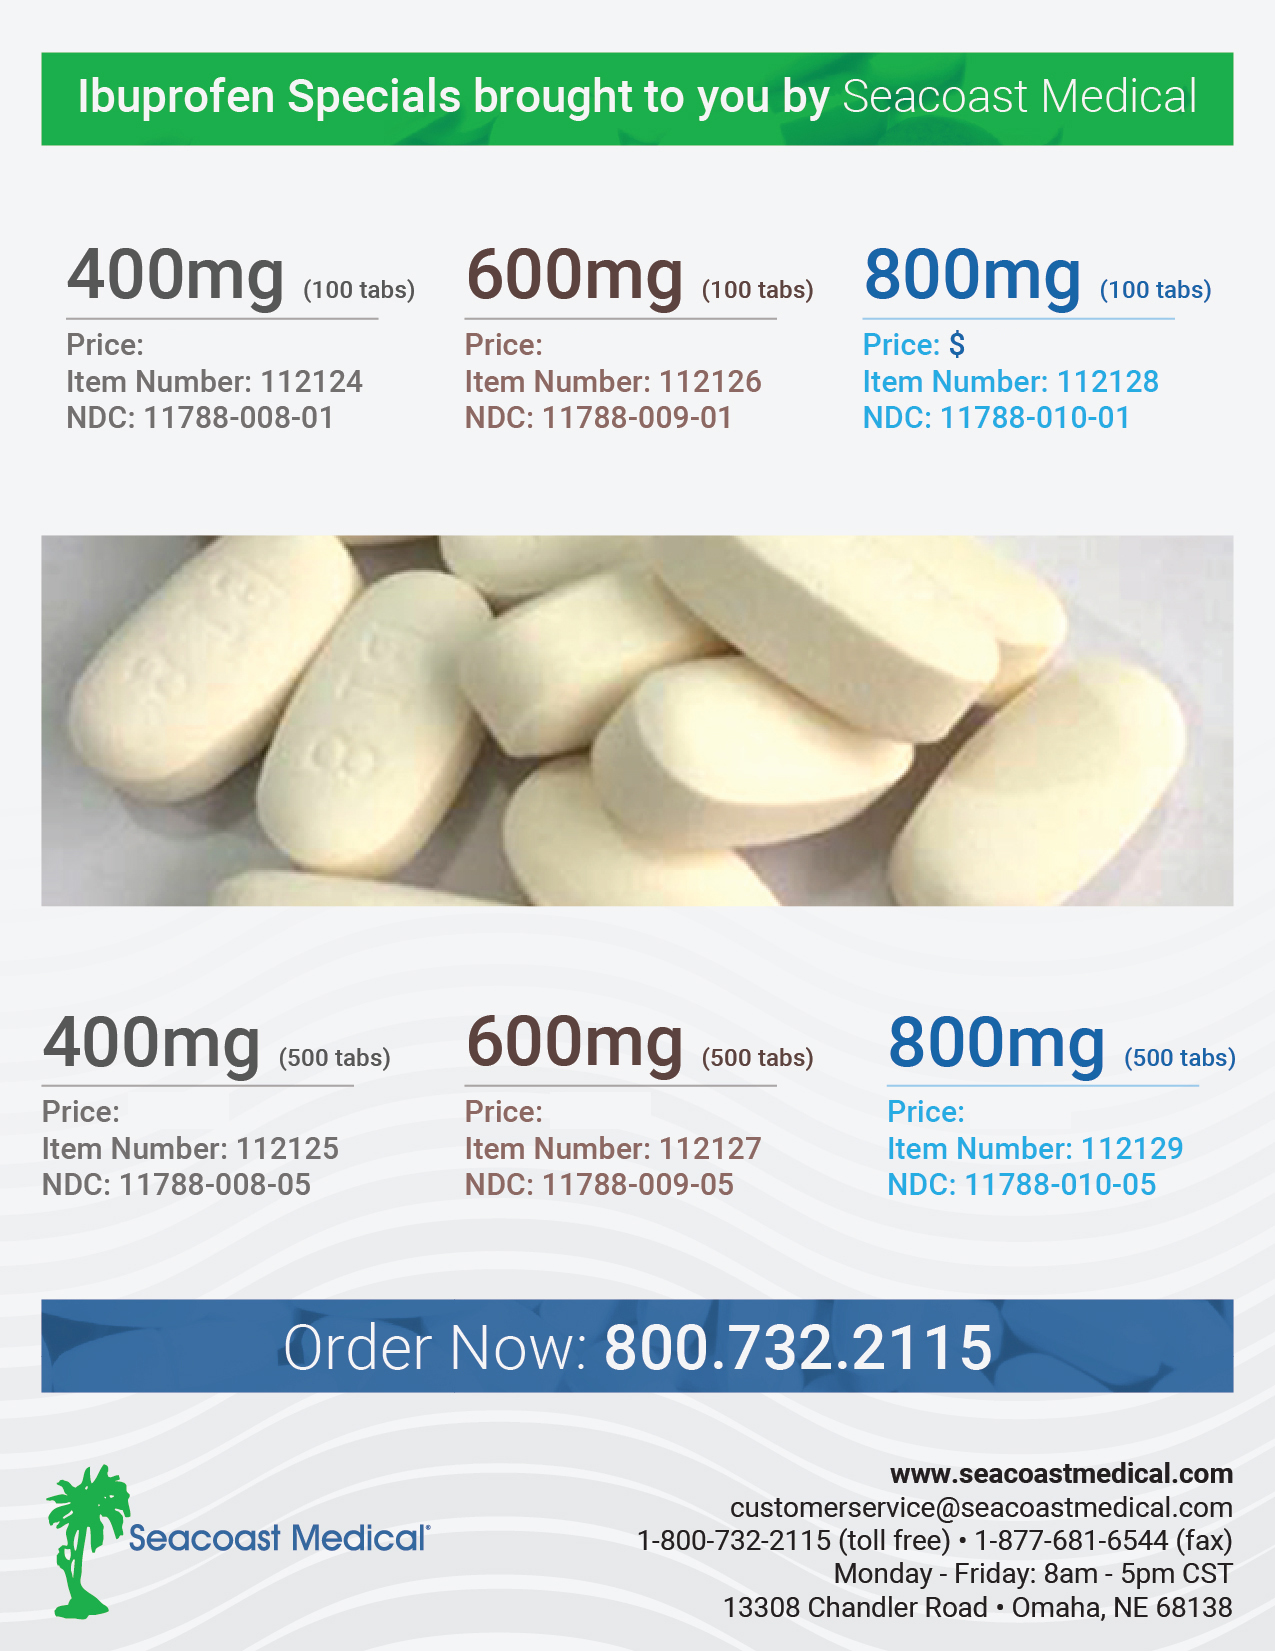 Ibuprofen Special flyer -